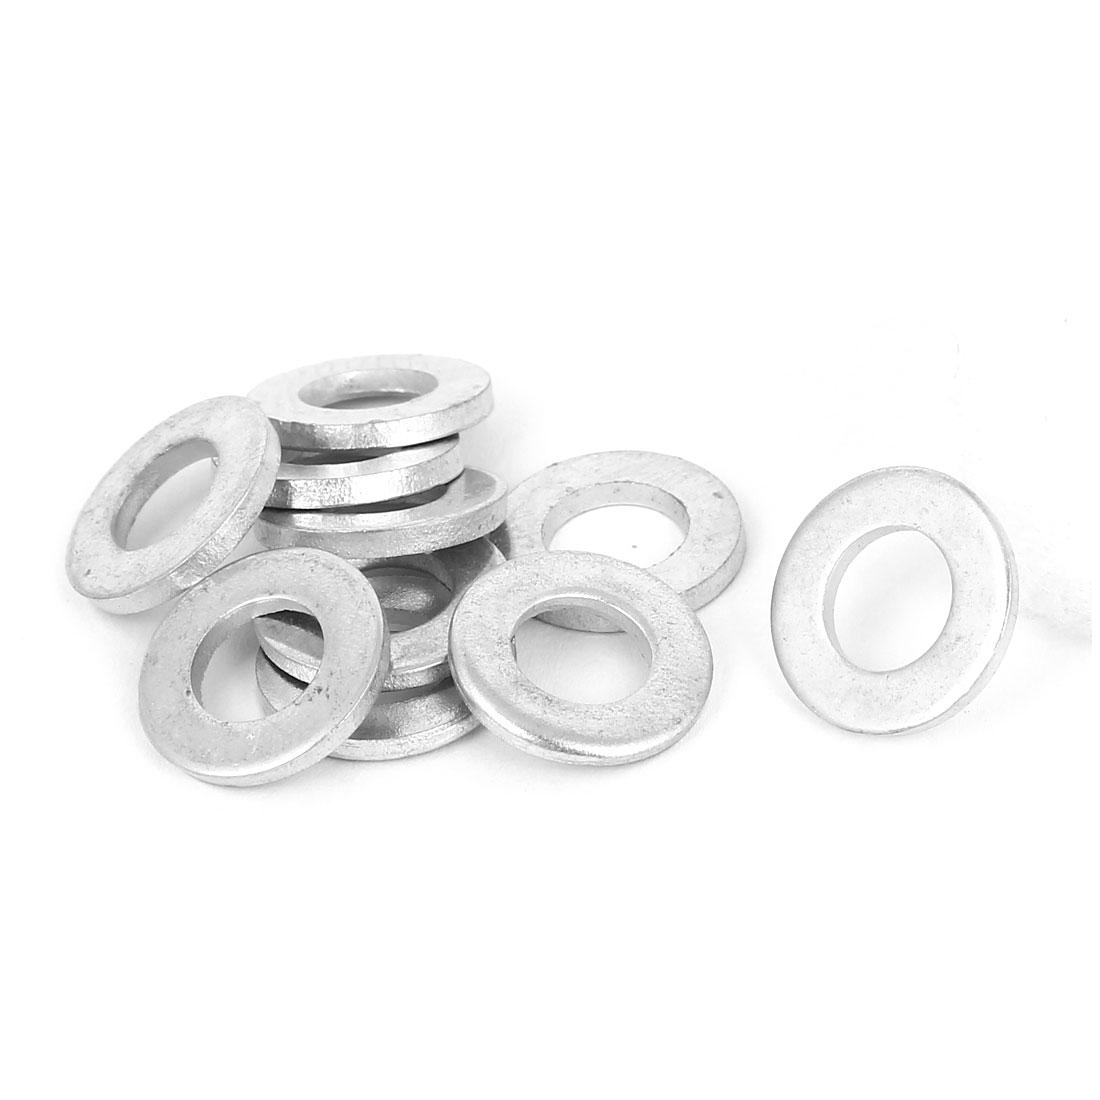 8mm x 16mm x 2mm Zinc Plated Flat Spacers Washers Gaskets Fasteners GB97 10PCS